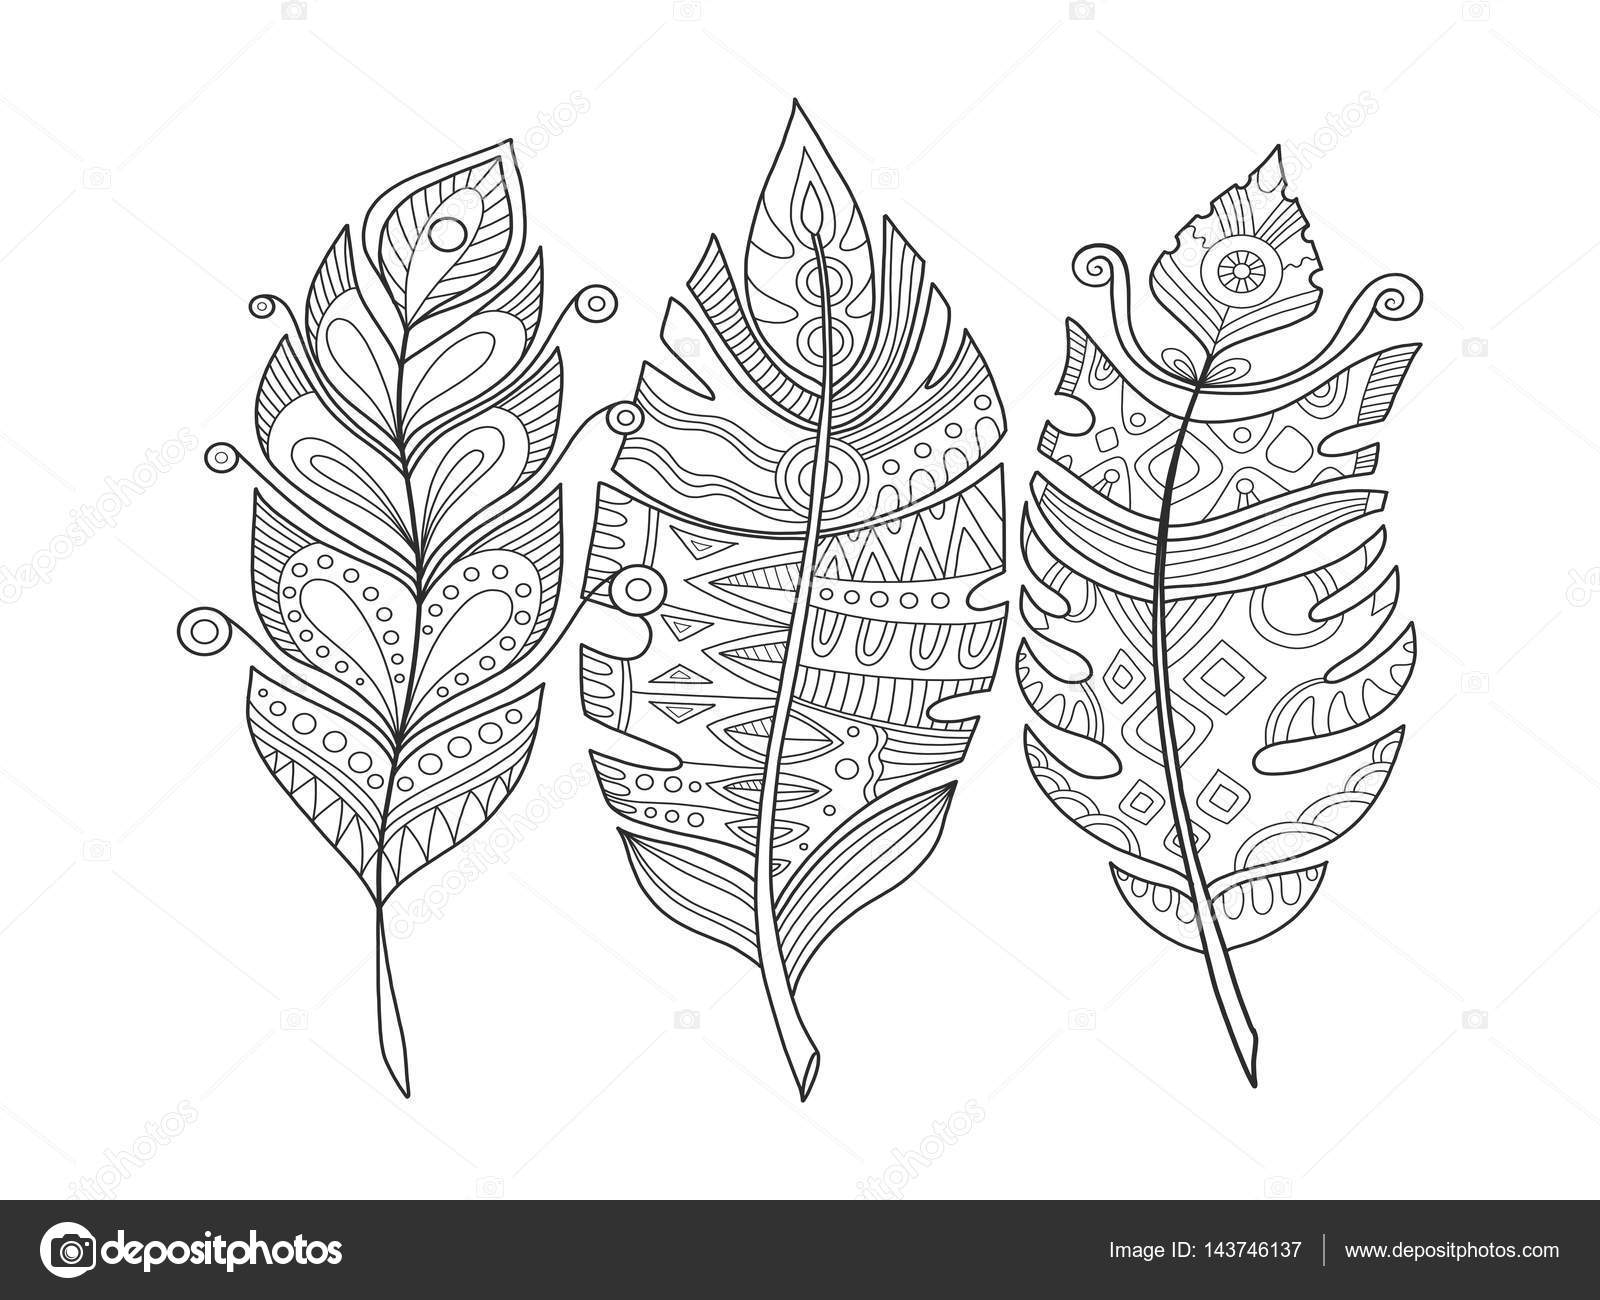 Imágenes Libros Con Plumas Para Dibujar Plumas Para